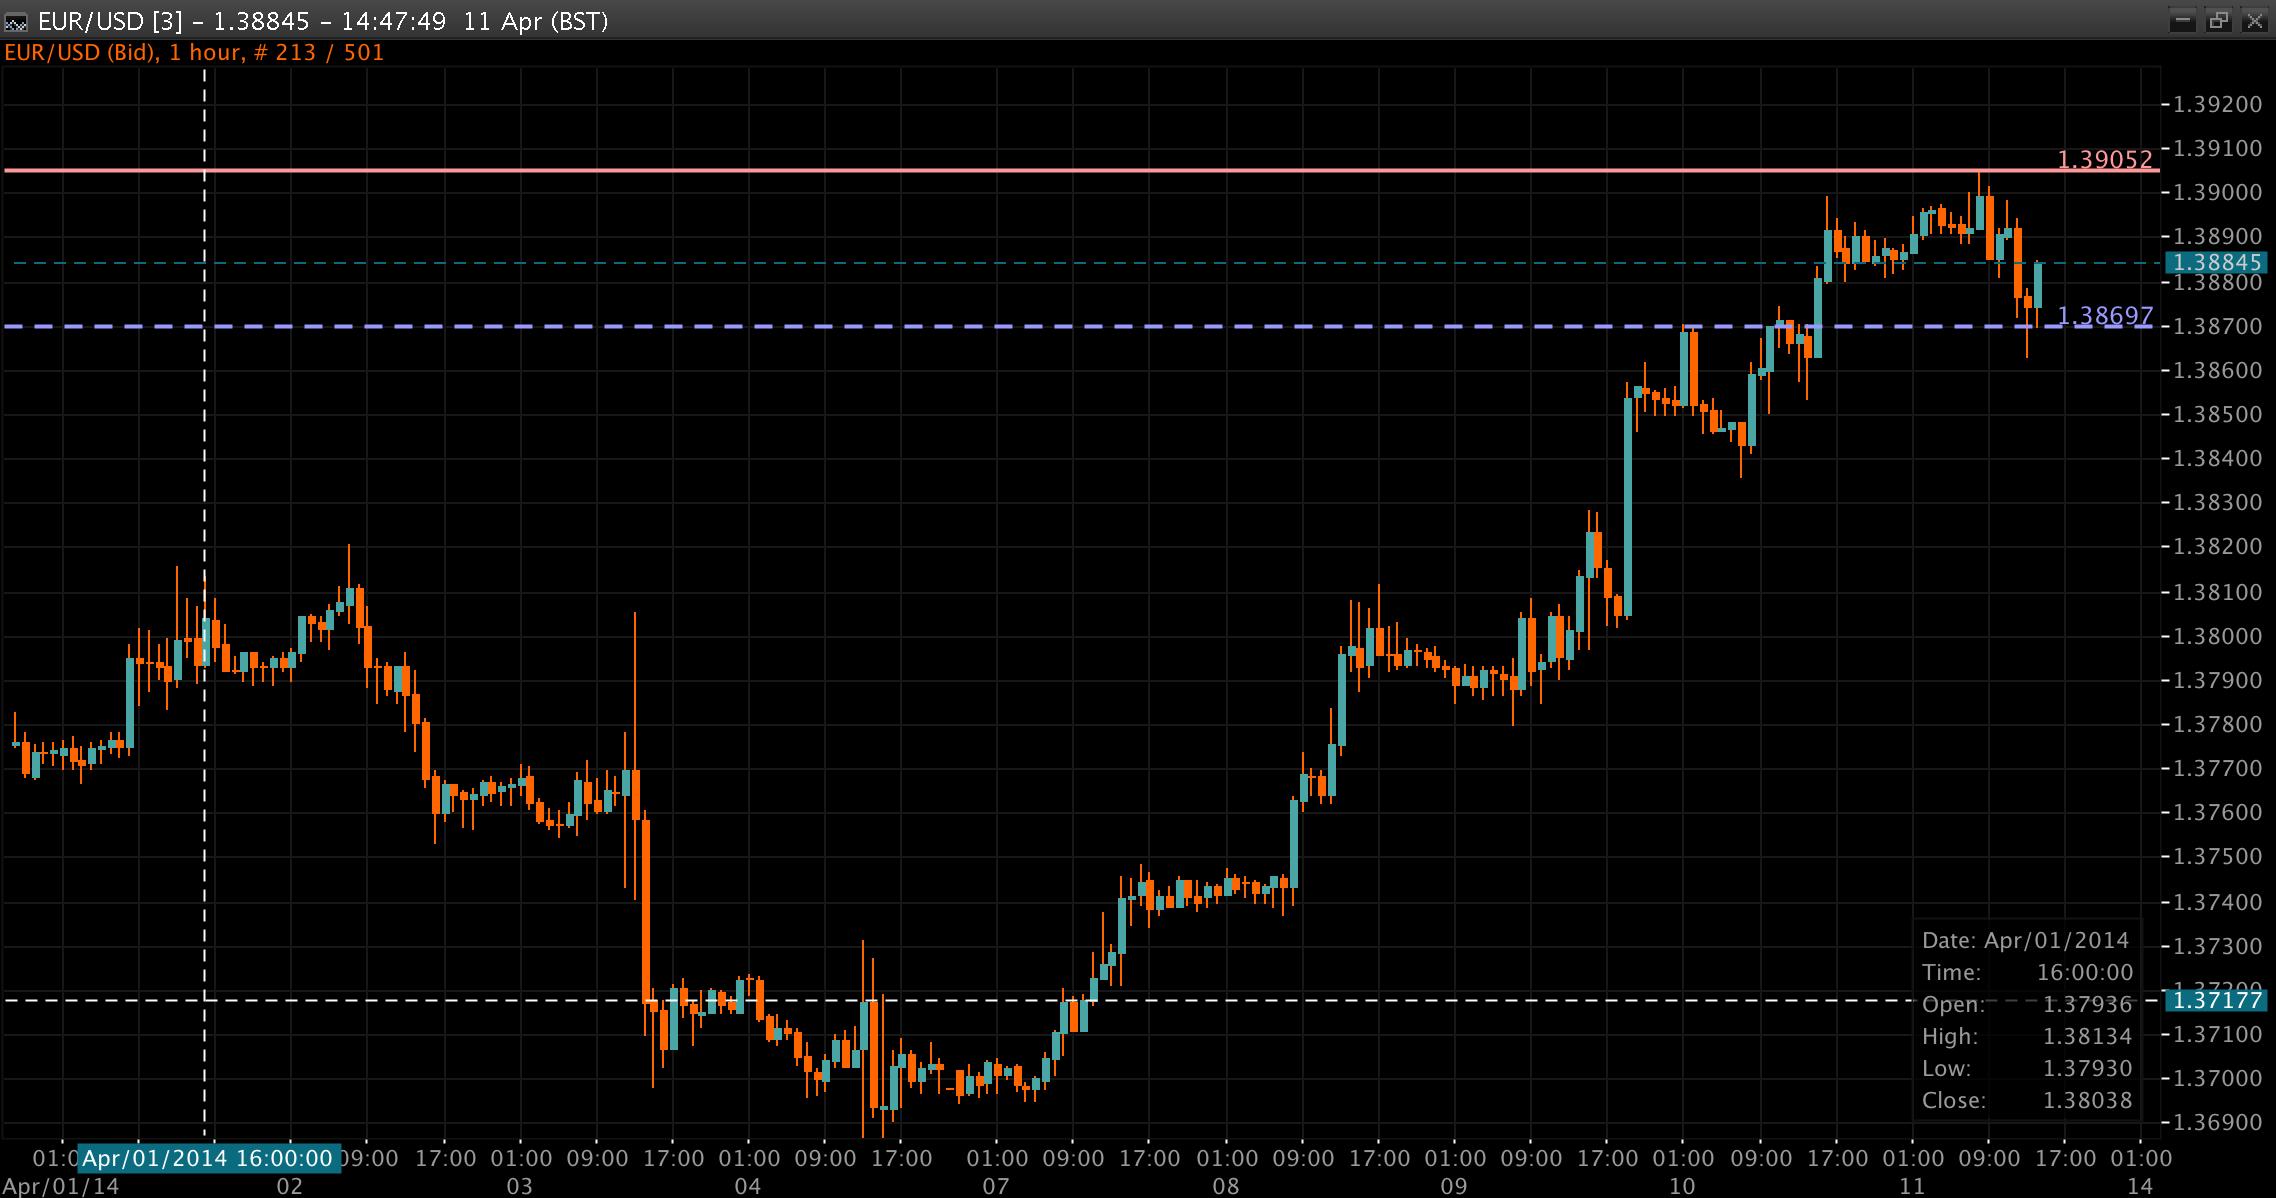 EUR/USD Chart 11 Apr 2014